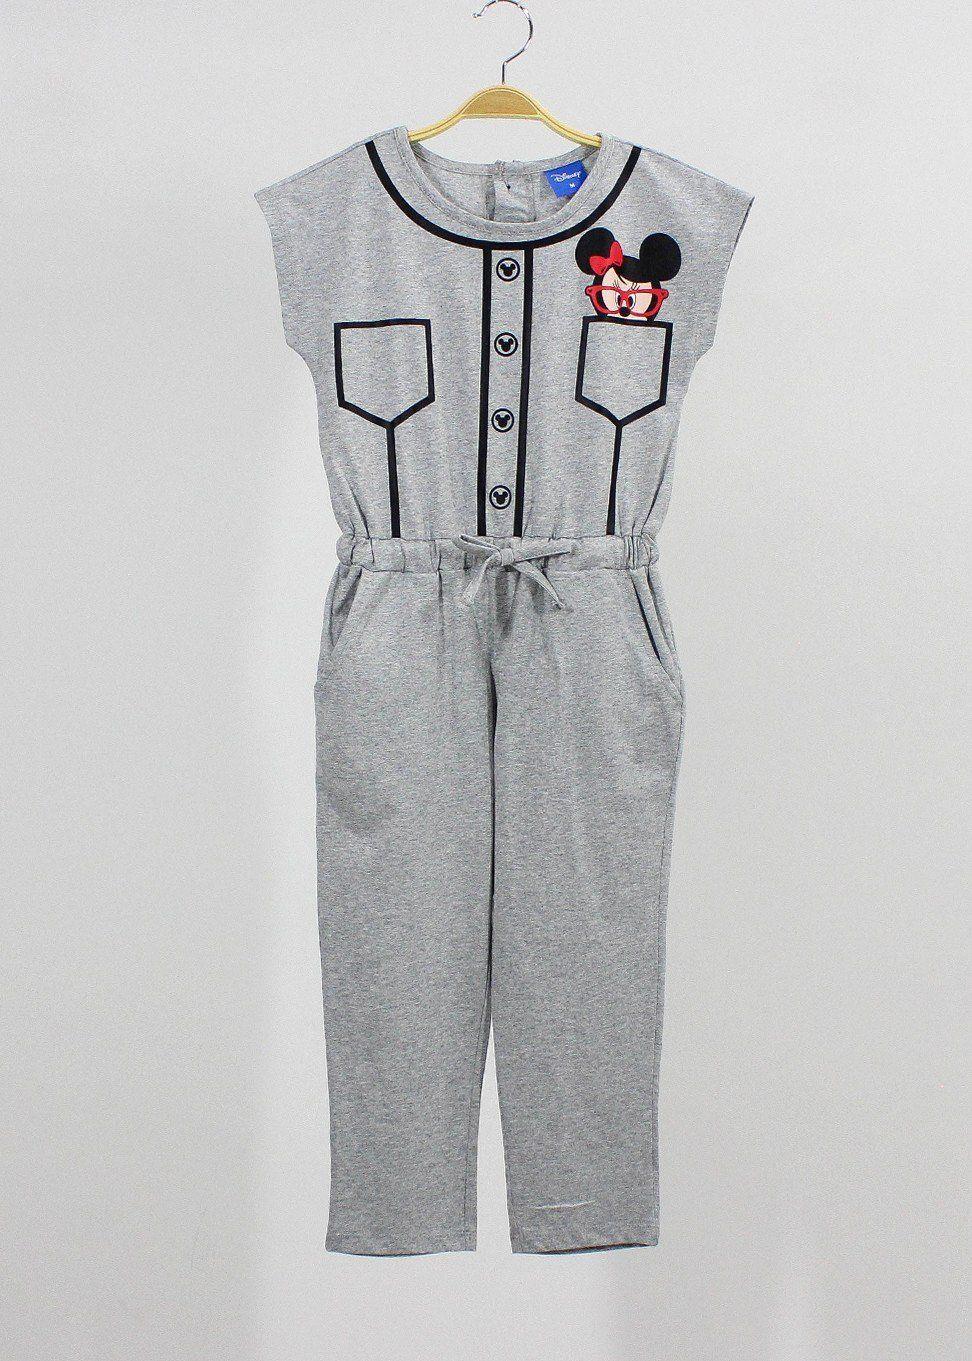 https://www.i-sabuy.com/ ชุดจั้มสูทเด็ก มิกกี้เม้าส์ Mickey – Kids Jumpsuit